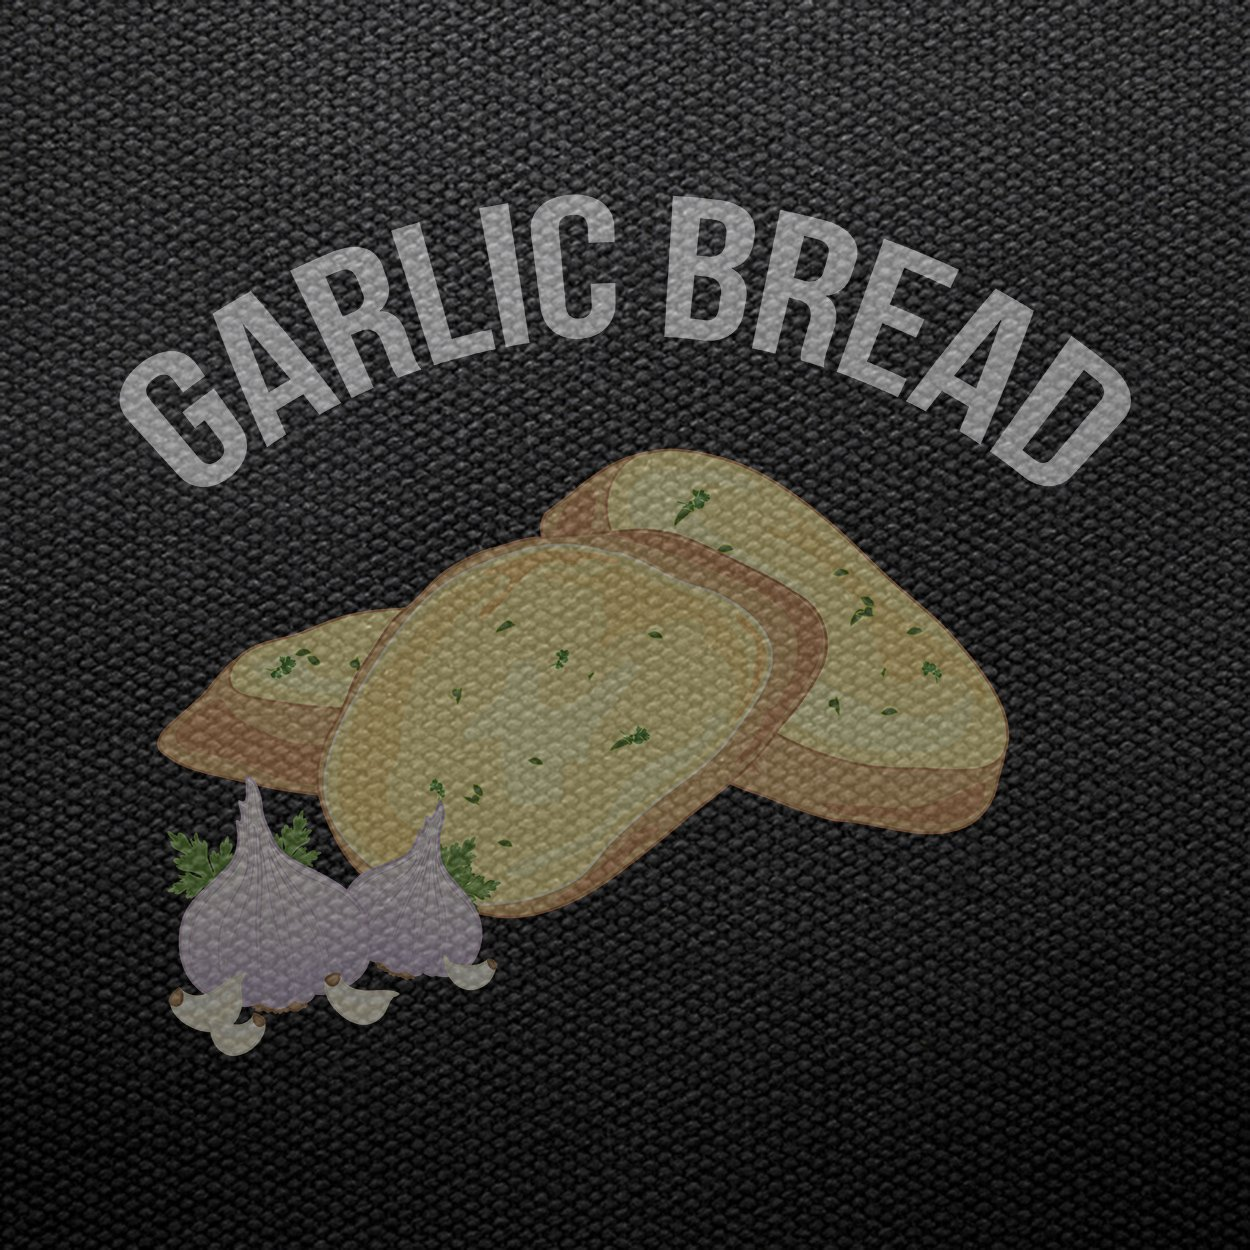 Teechopchop Garlic Bread,Funny Graphic,Gift Tank Top